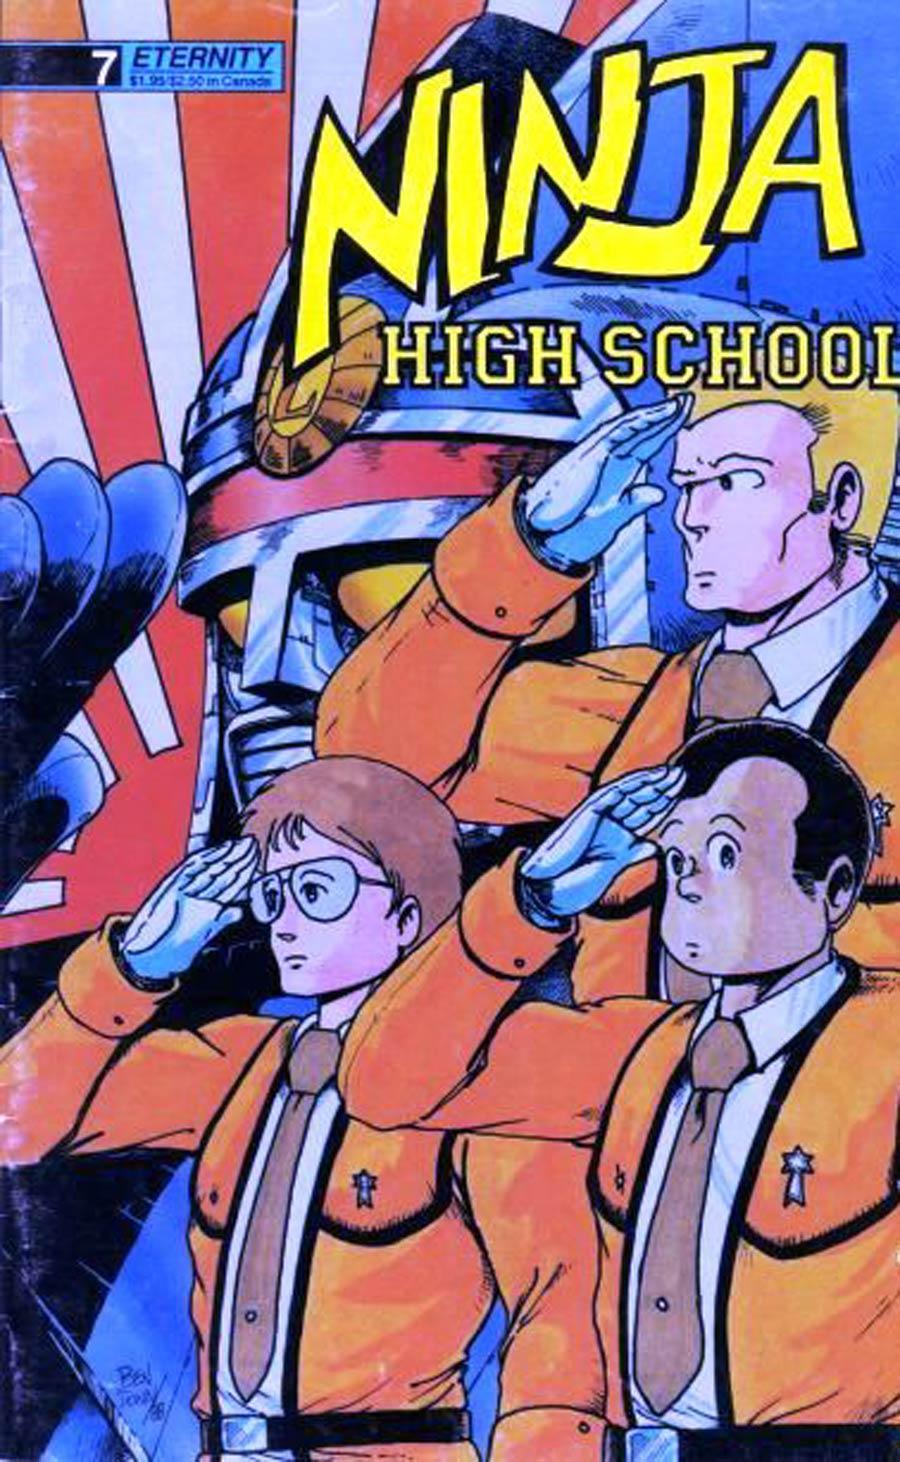 Ninja High School #7